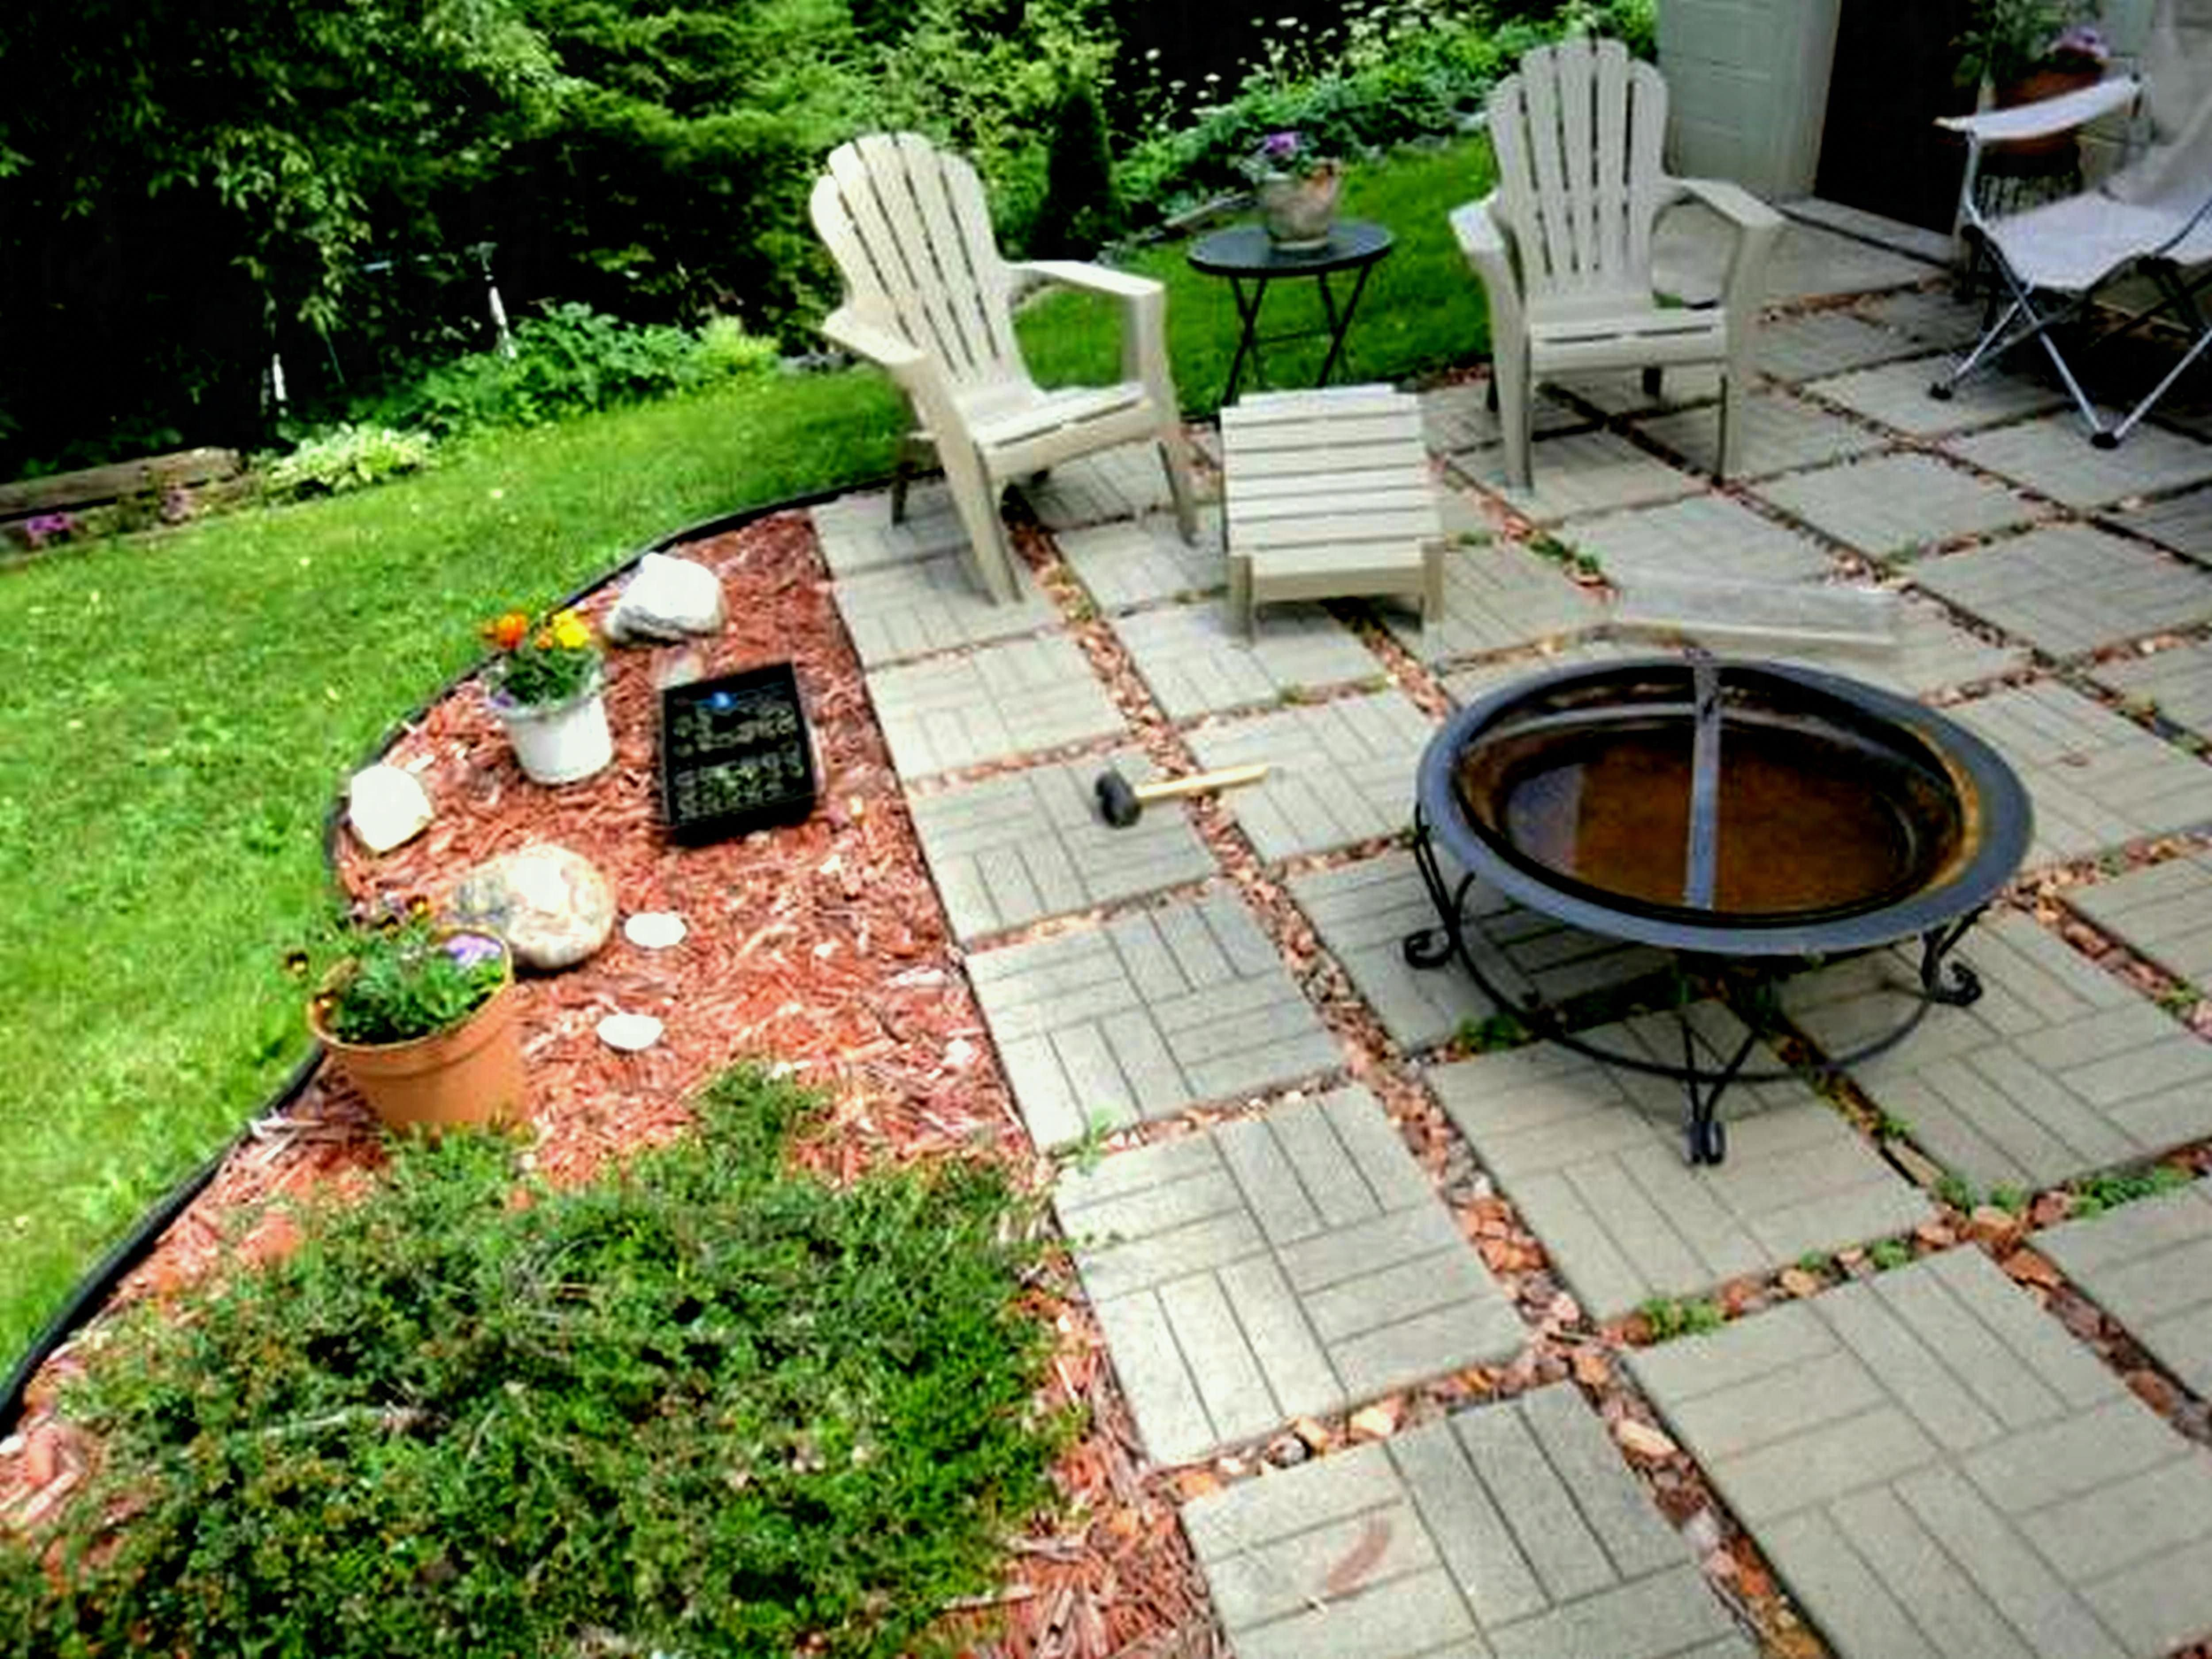 Astonishing Cheap No Grass Backyard Ideas If You Re On The Lookout For An Alternate Remedy To Kill Your Grass Sloped Backyard No Grass Backyard Cheap Backyard